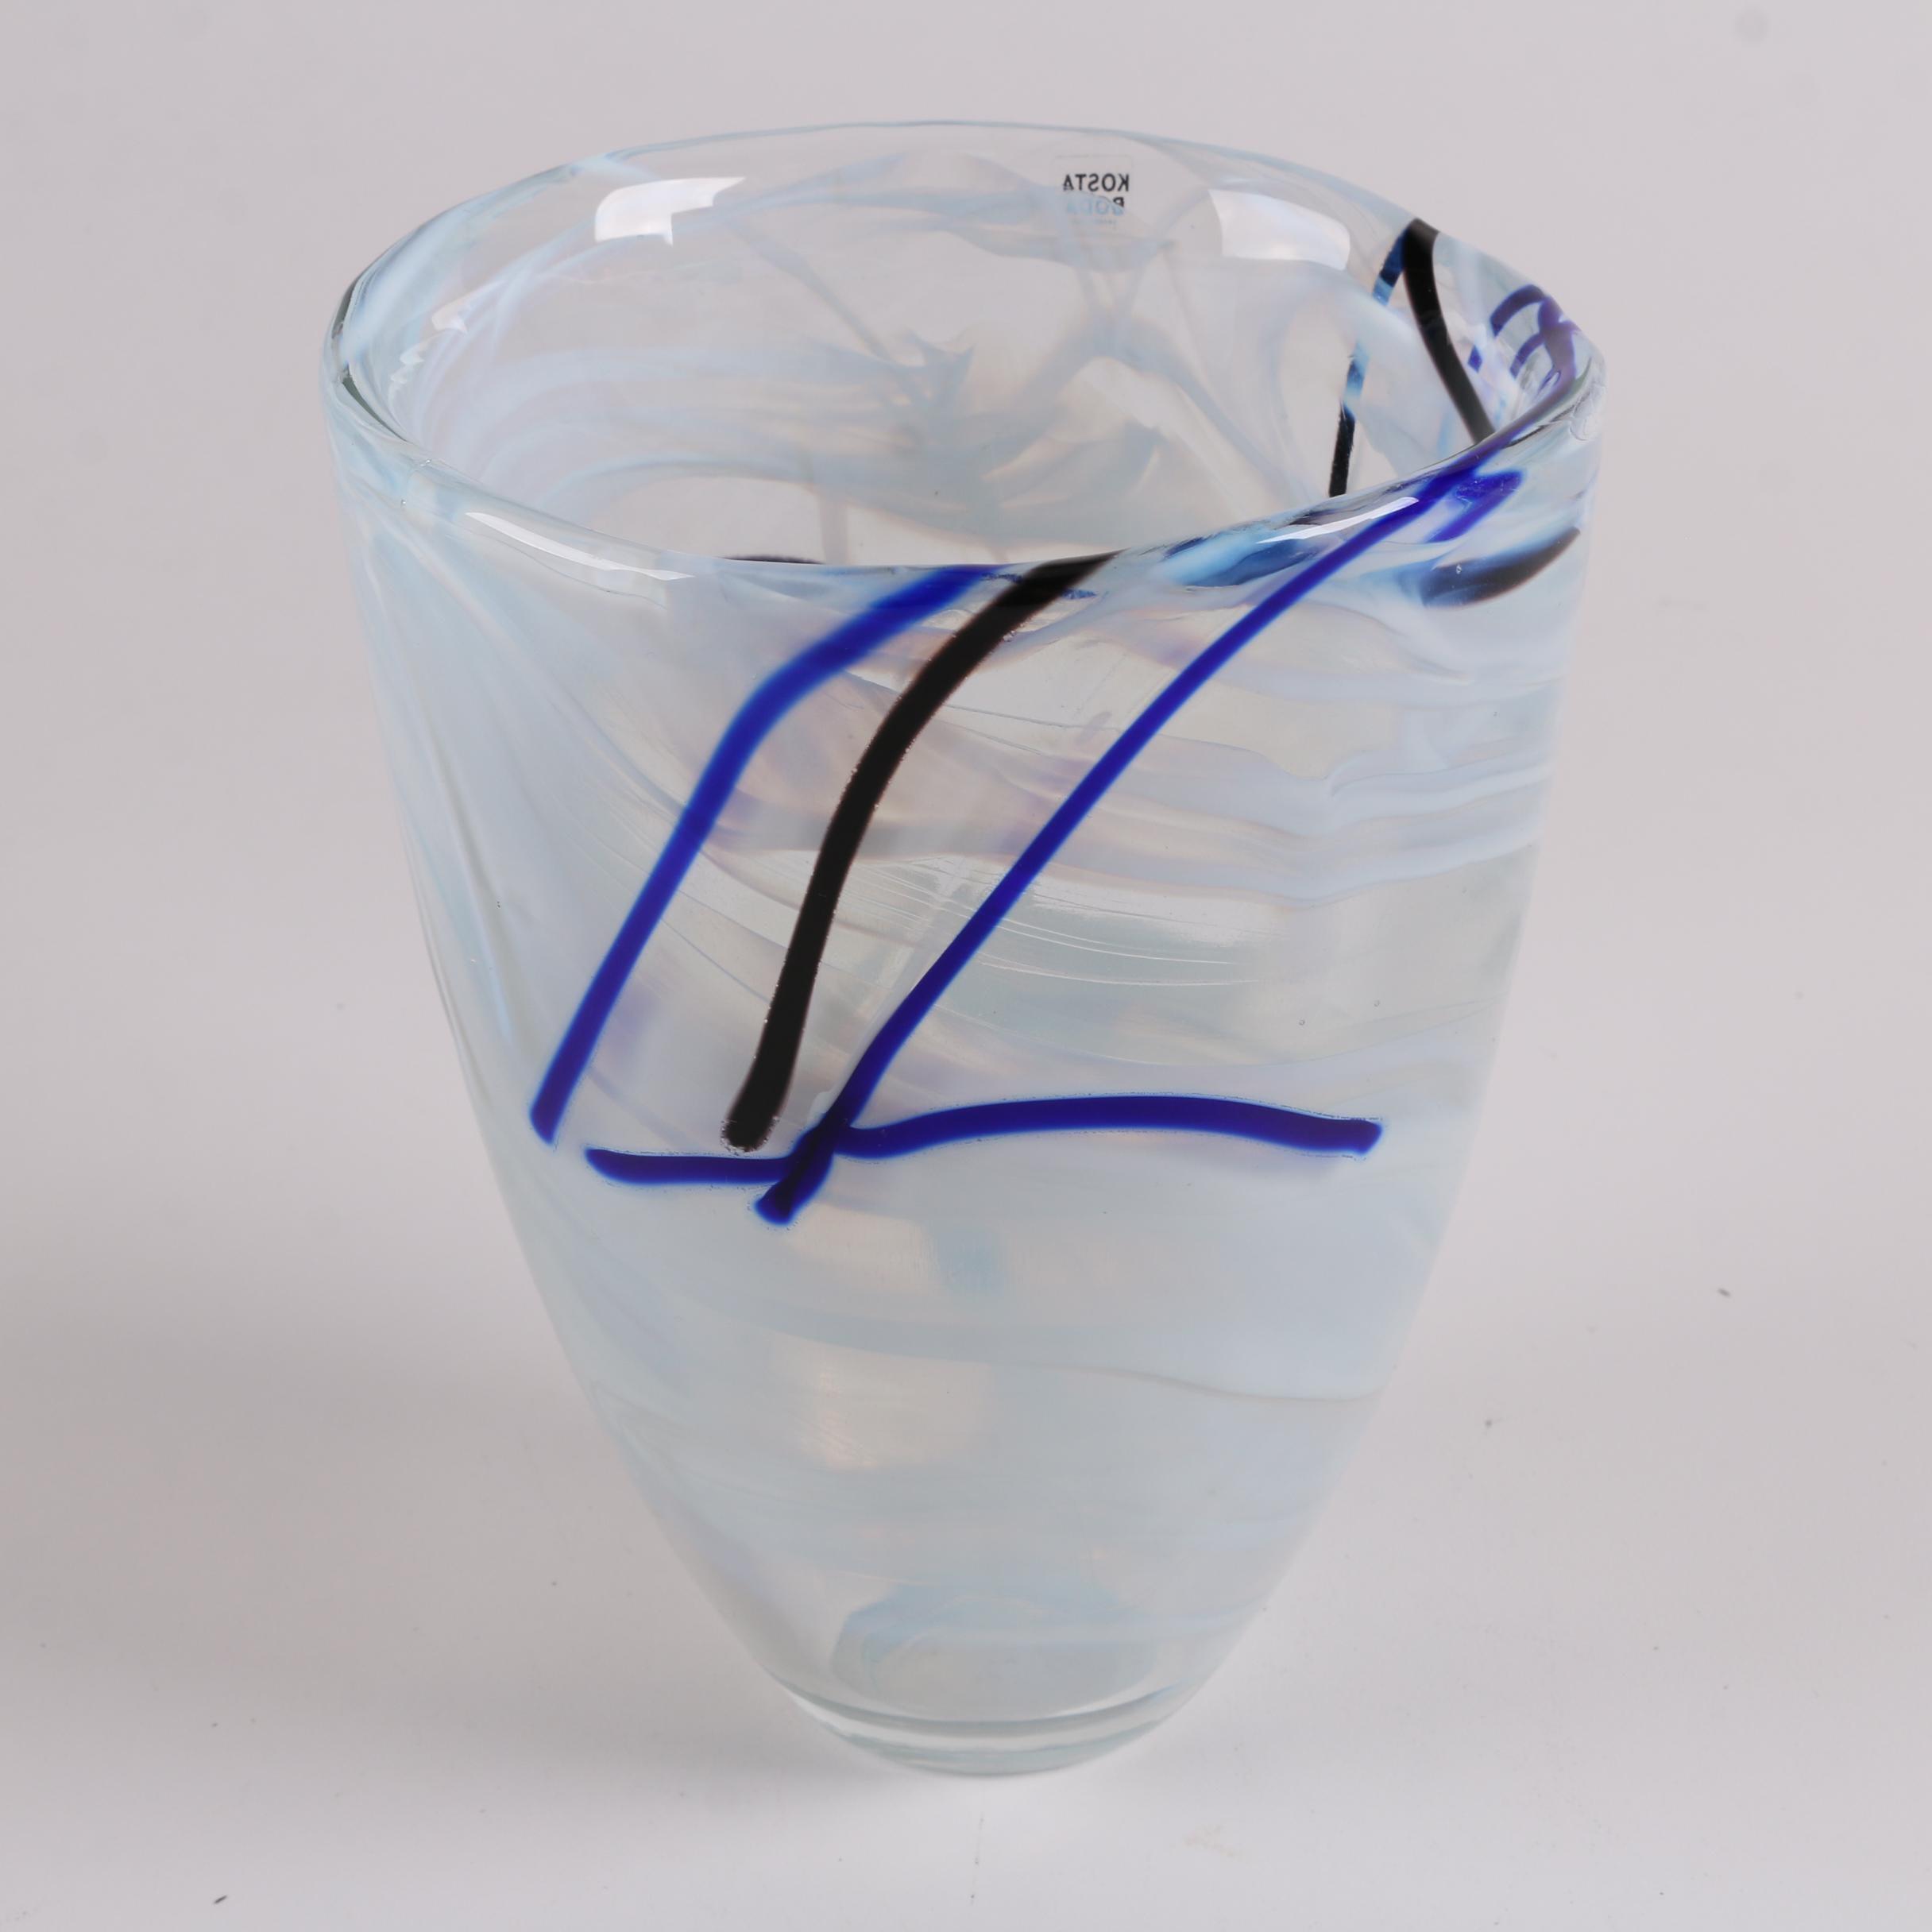 Kosta Boda Blown Art Glass Vase featuring Blue, White and Black Ribbon Design